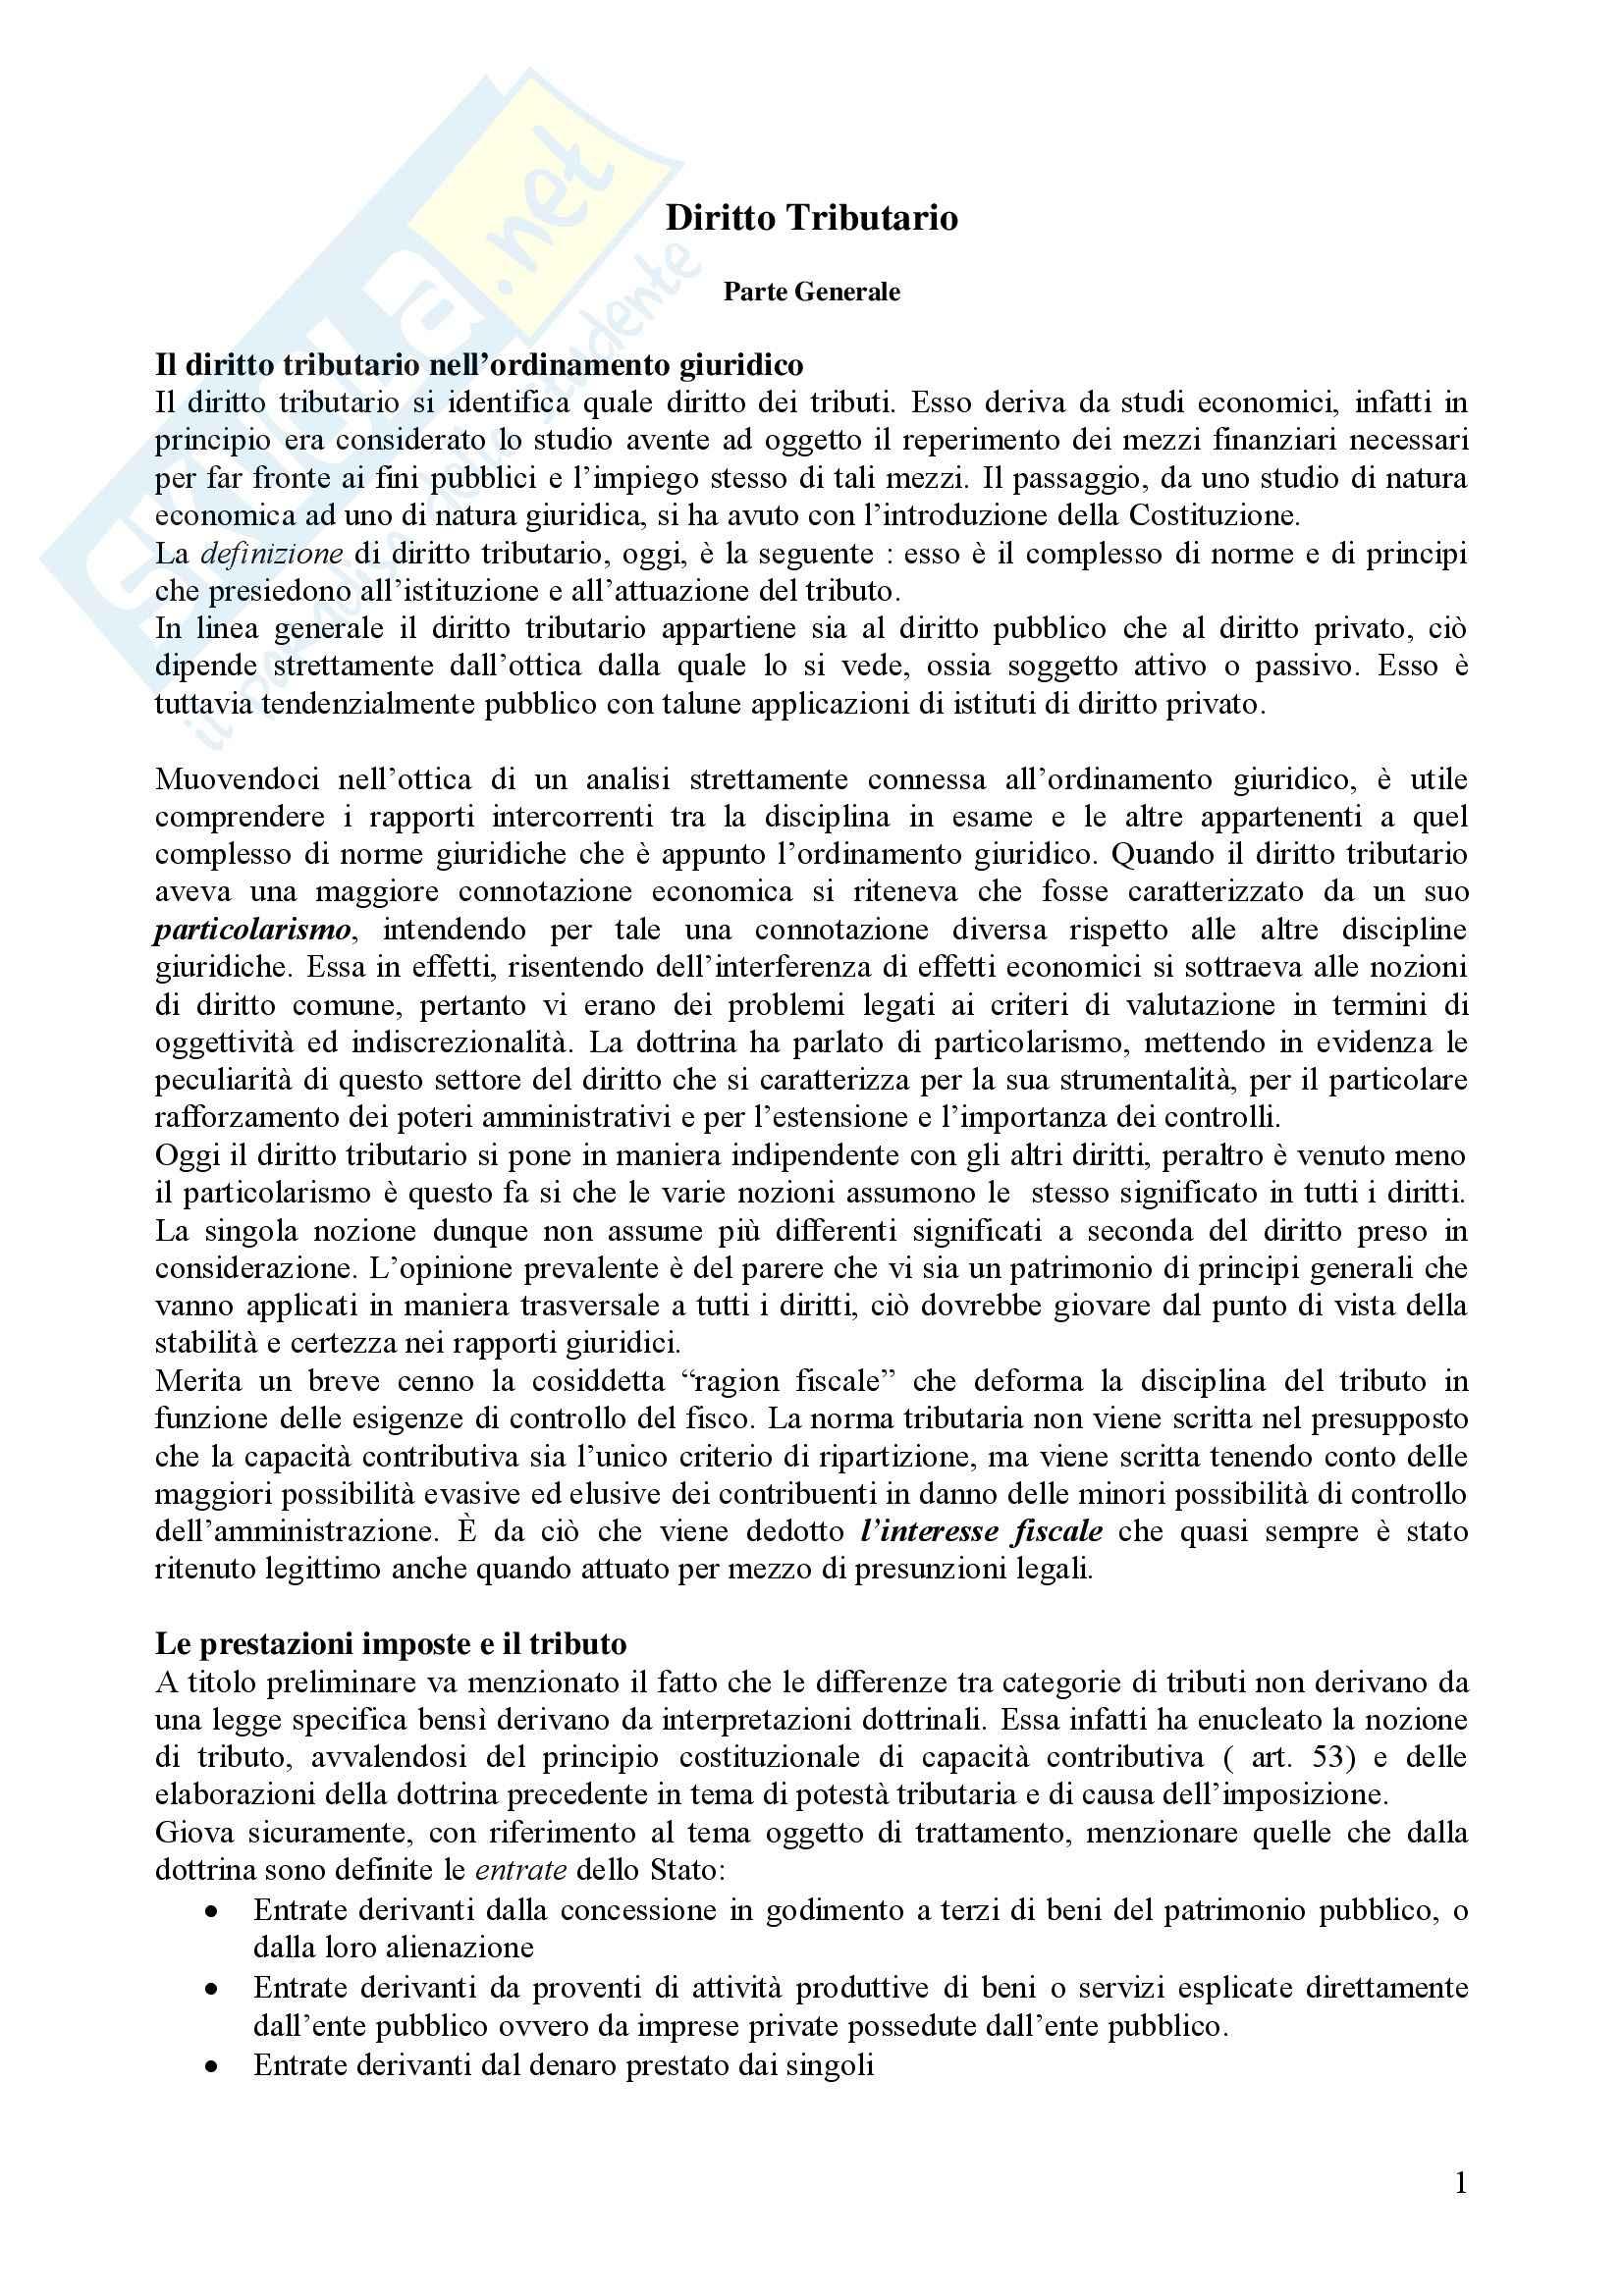 Riassunto esame diritto tributario, prof. Fantozzi